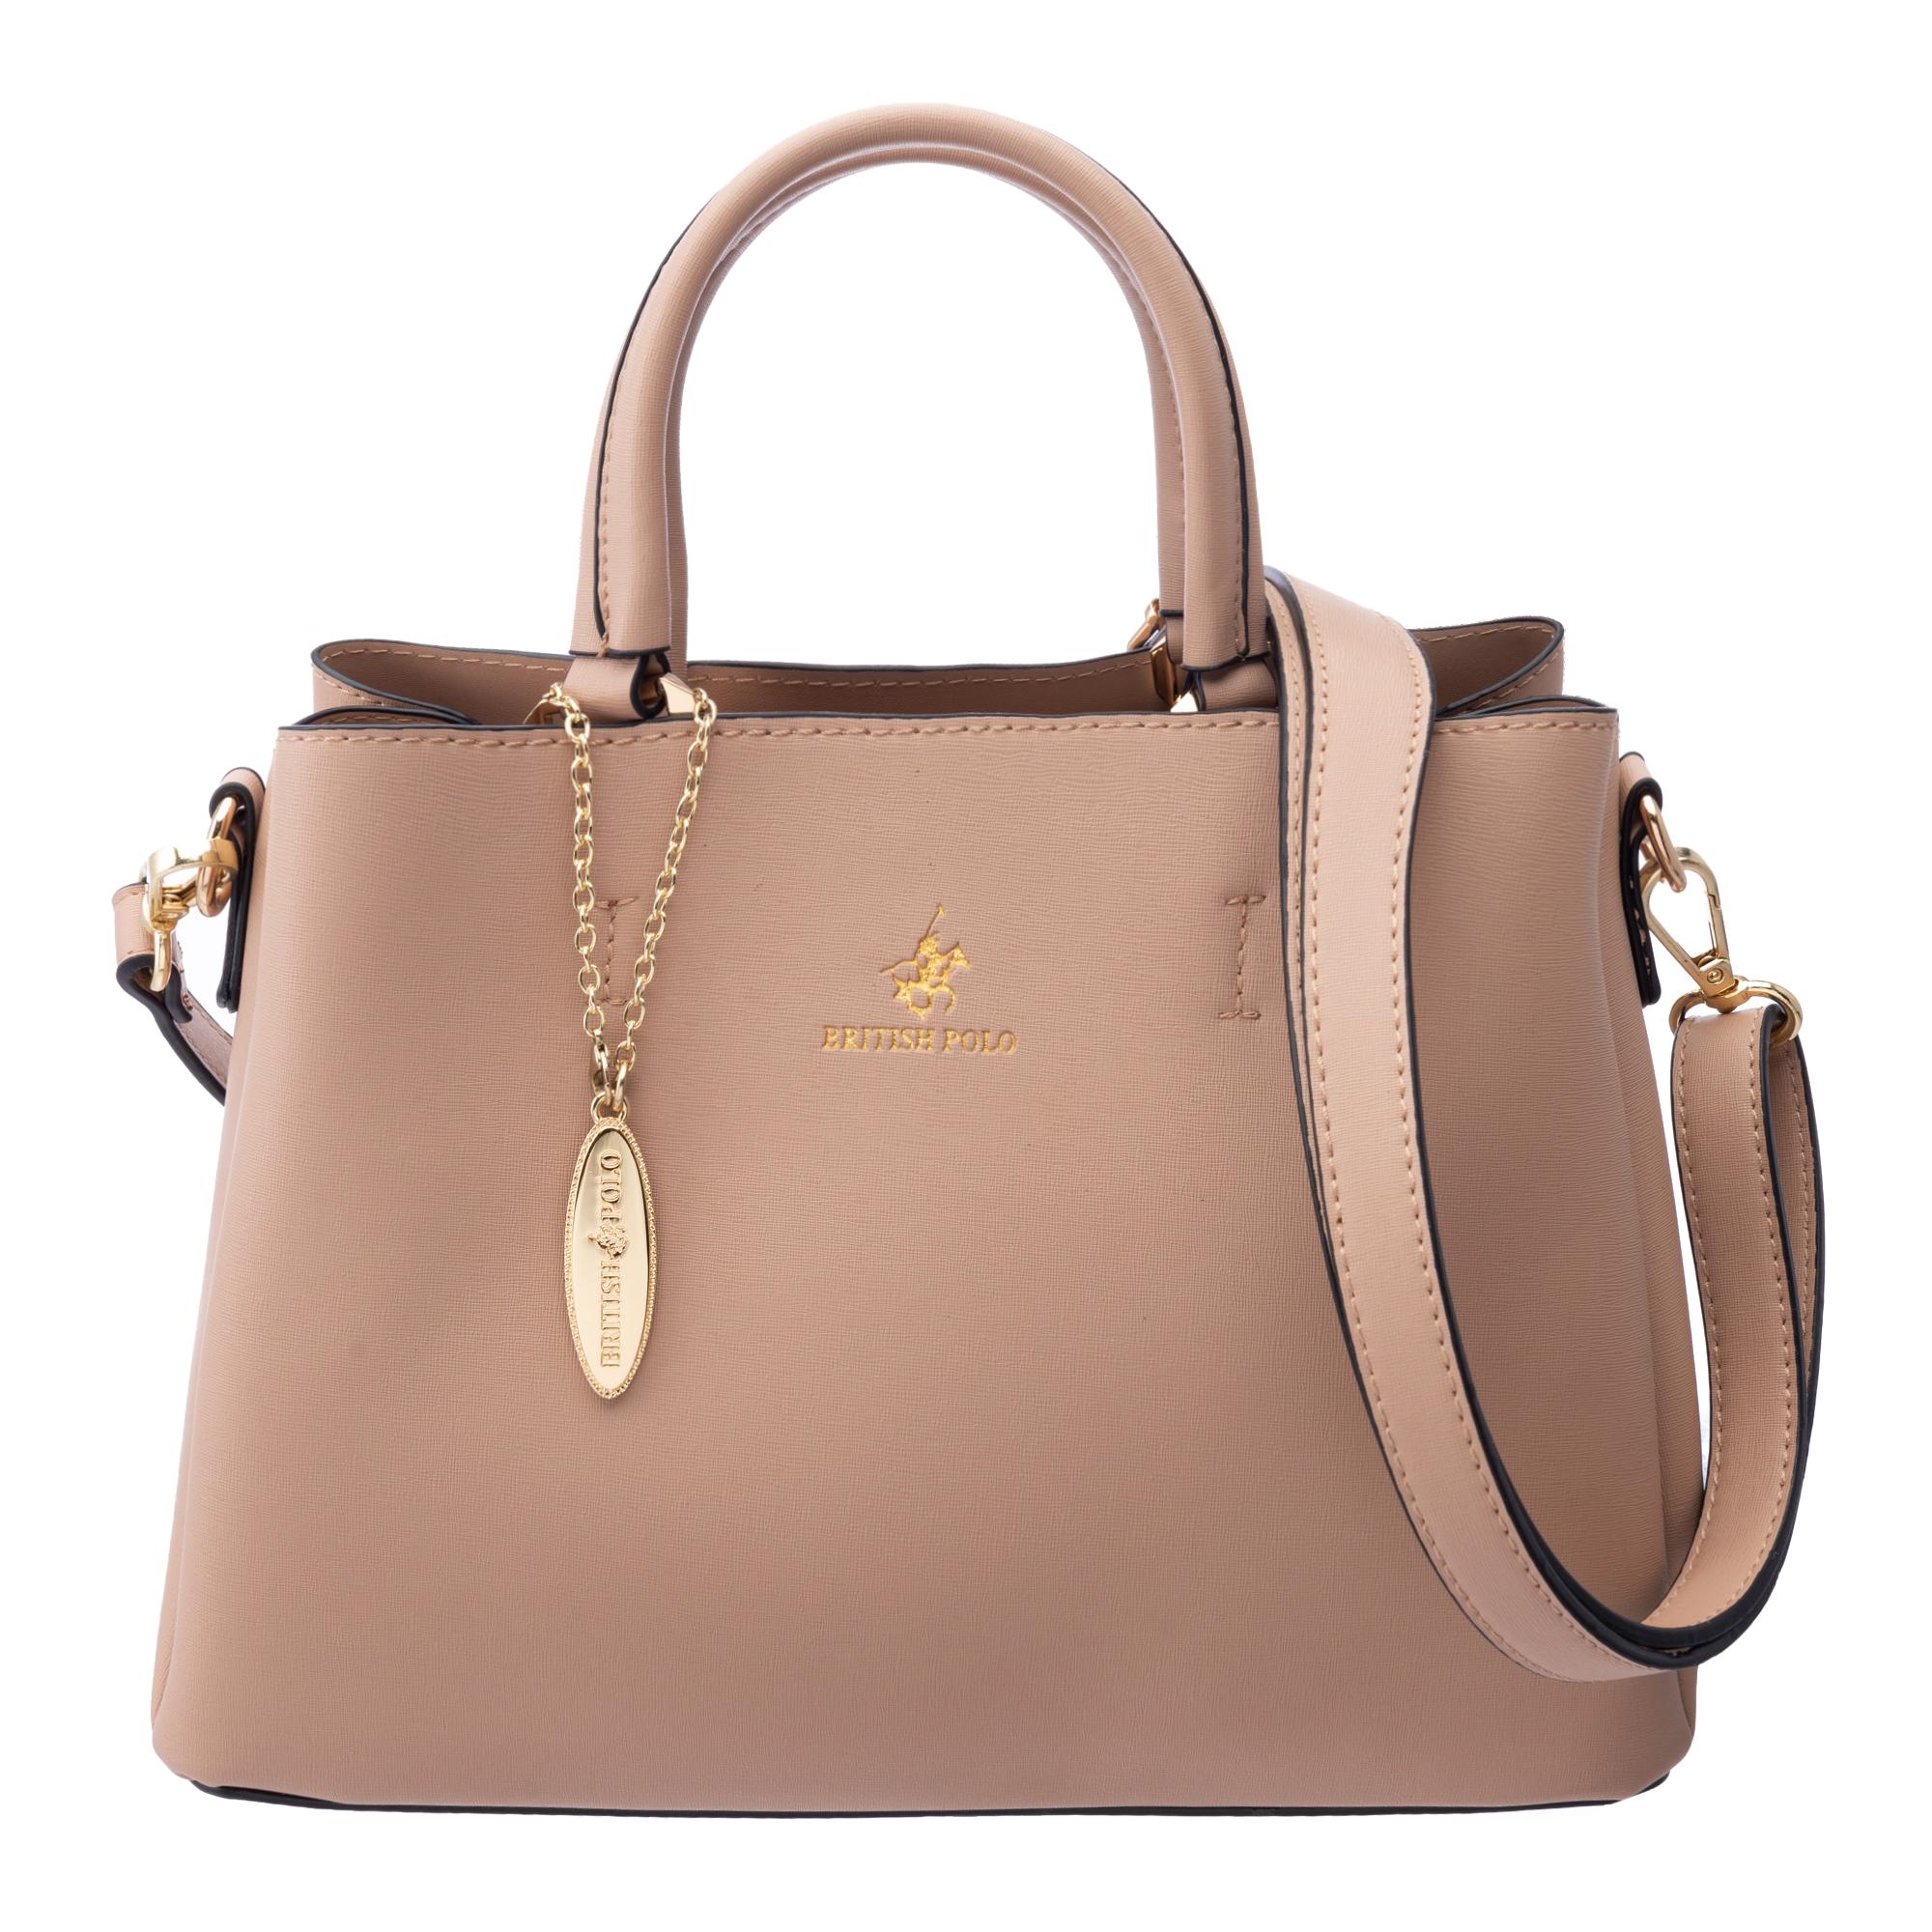 British Polo Latest Design Elegant Handbag